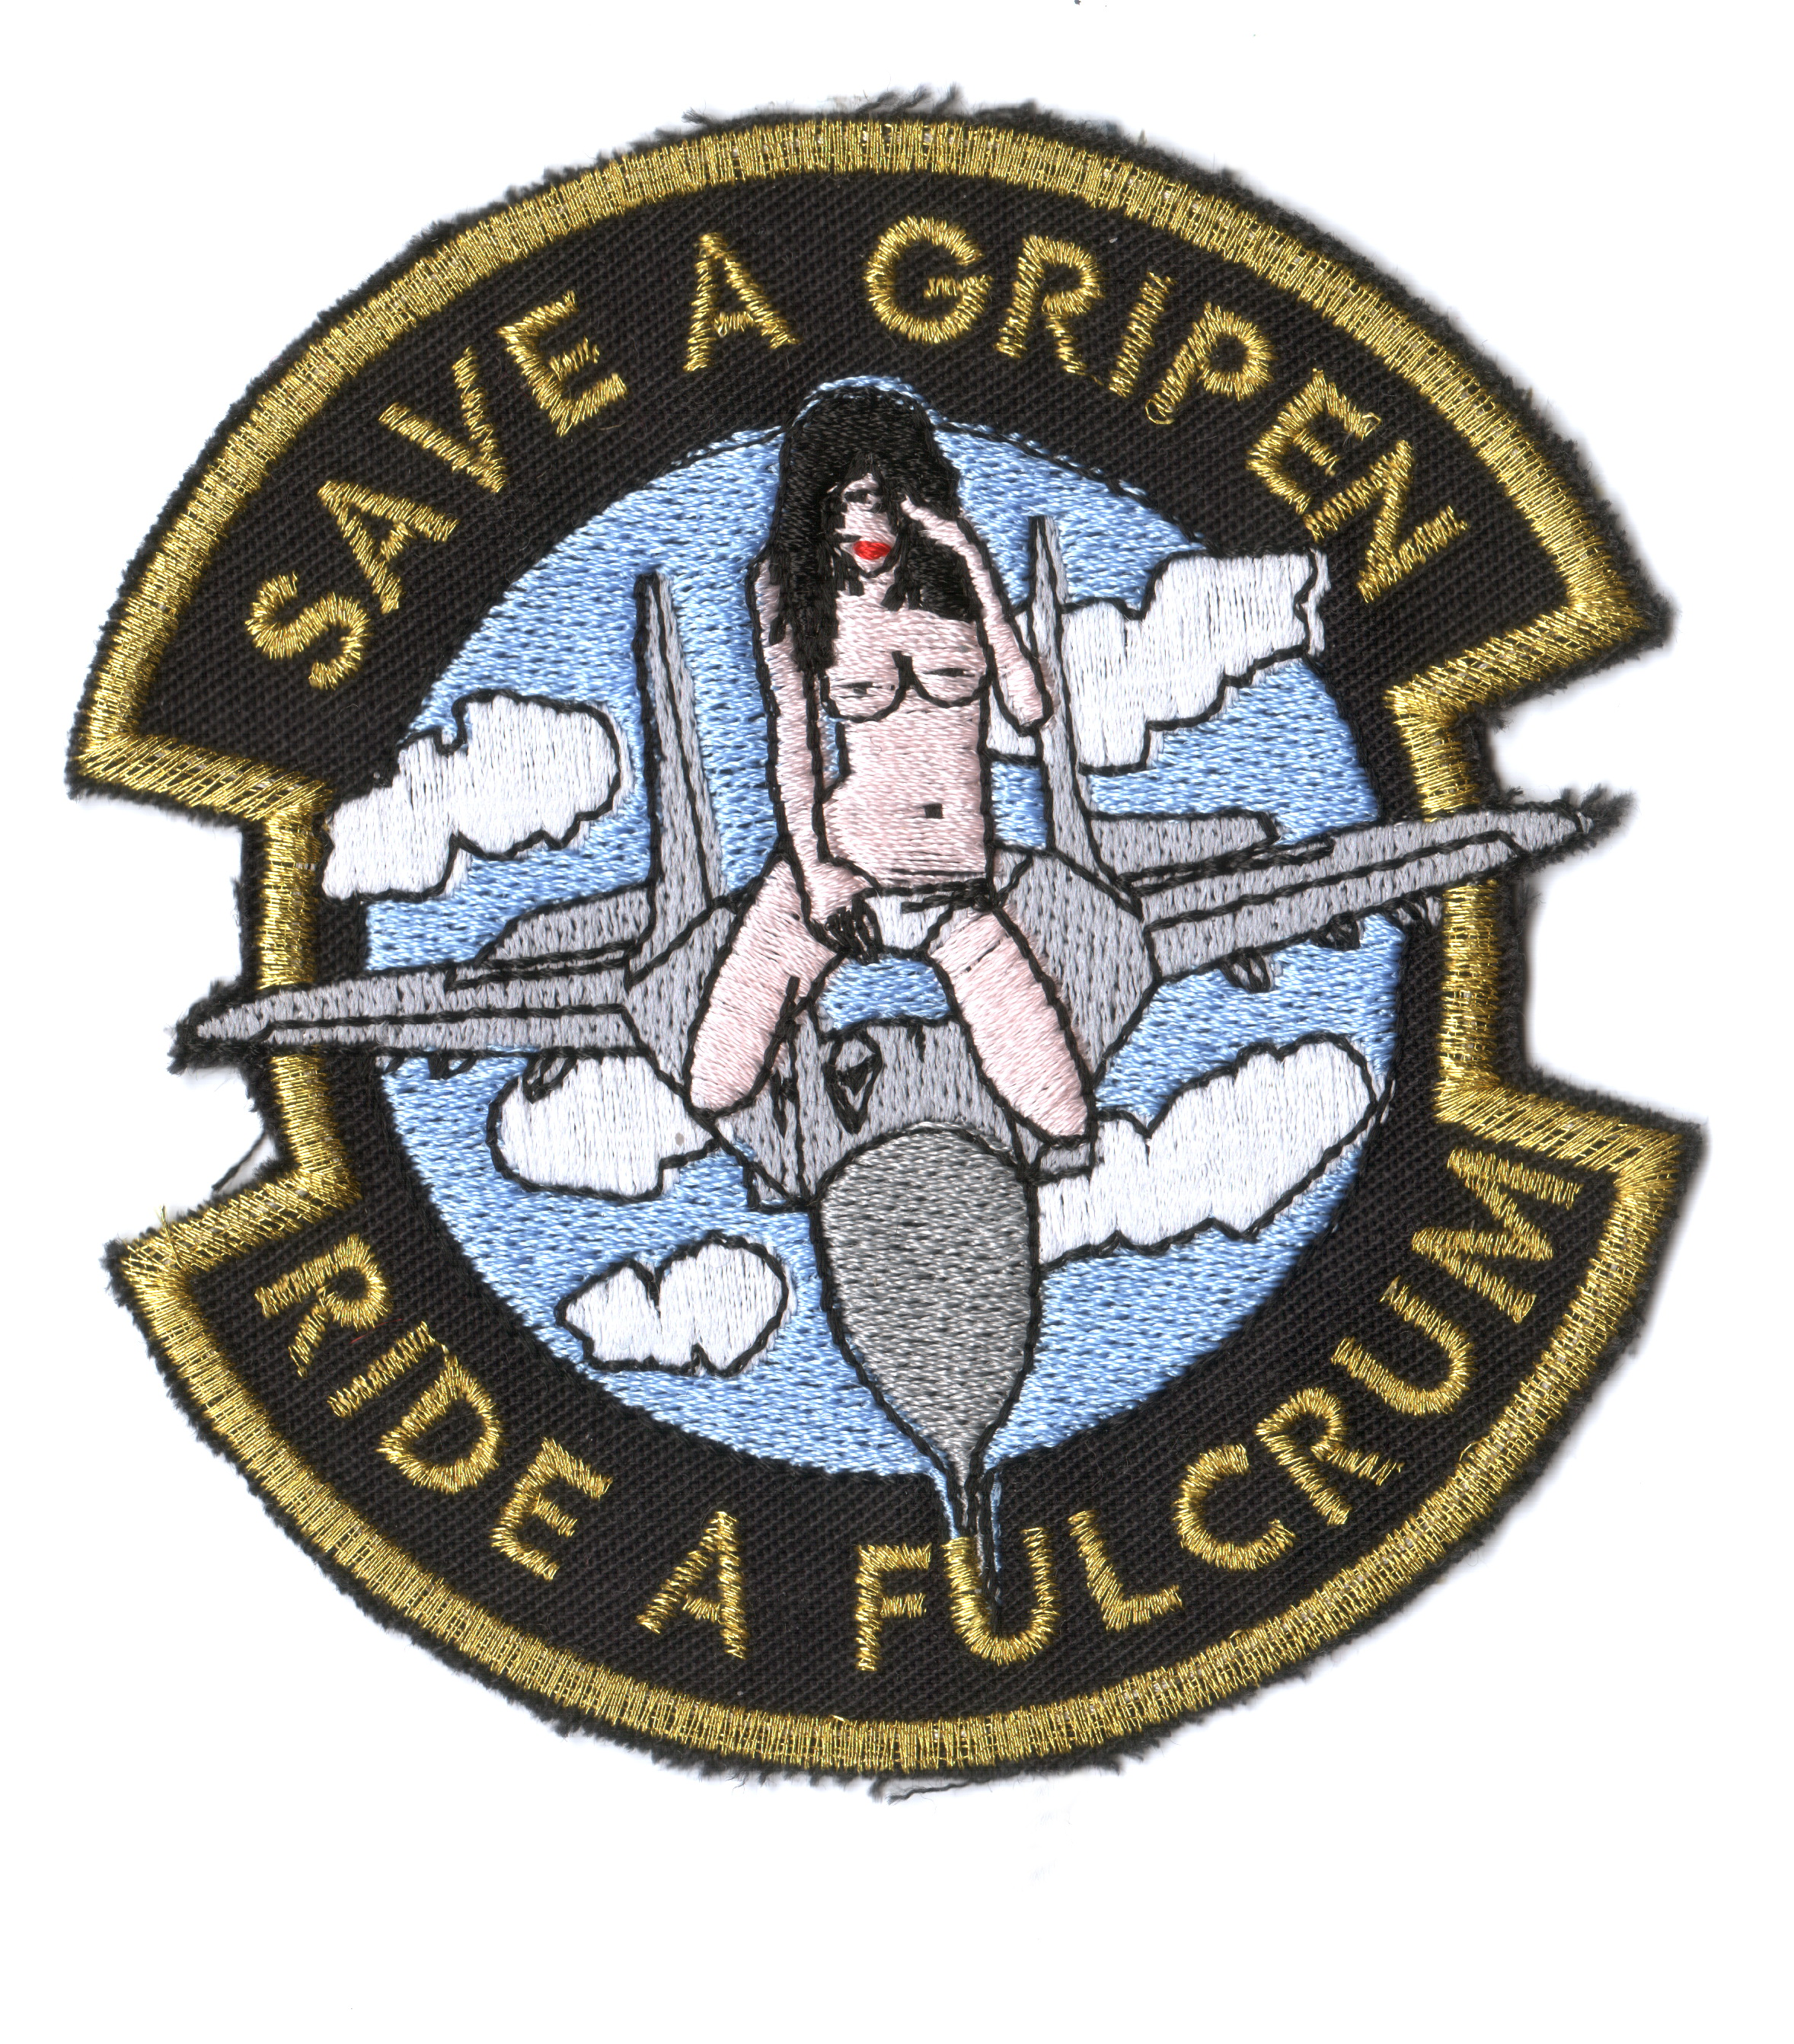 c6f02f725e5d Save a Gripen - Ride a Fulcrum felvarró JETfly Military Webshop